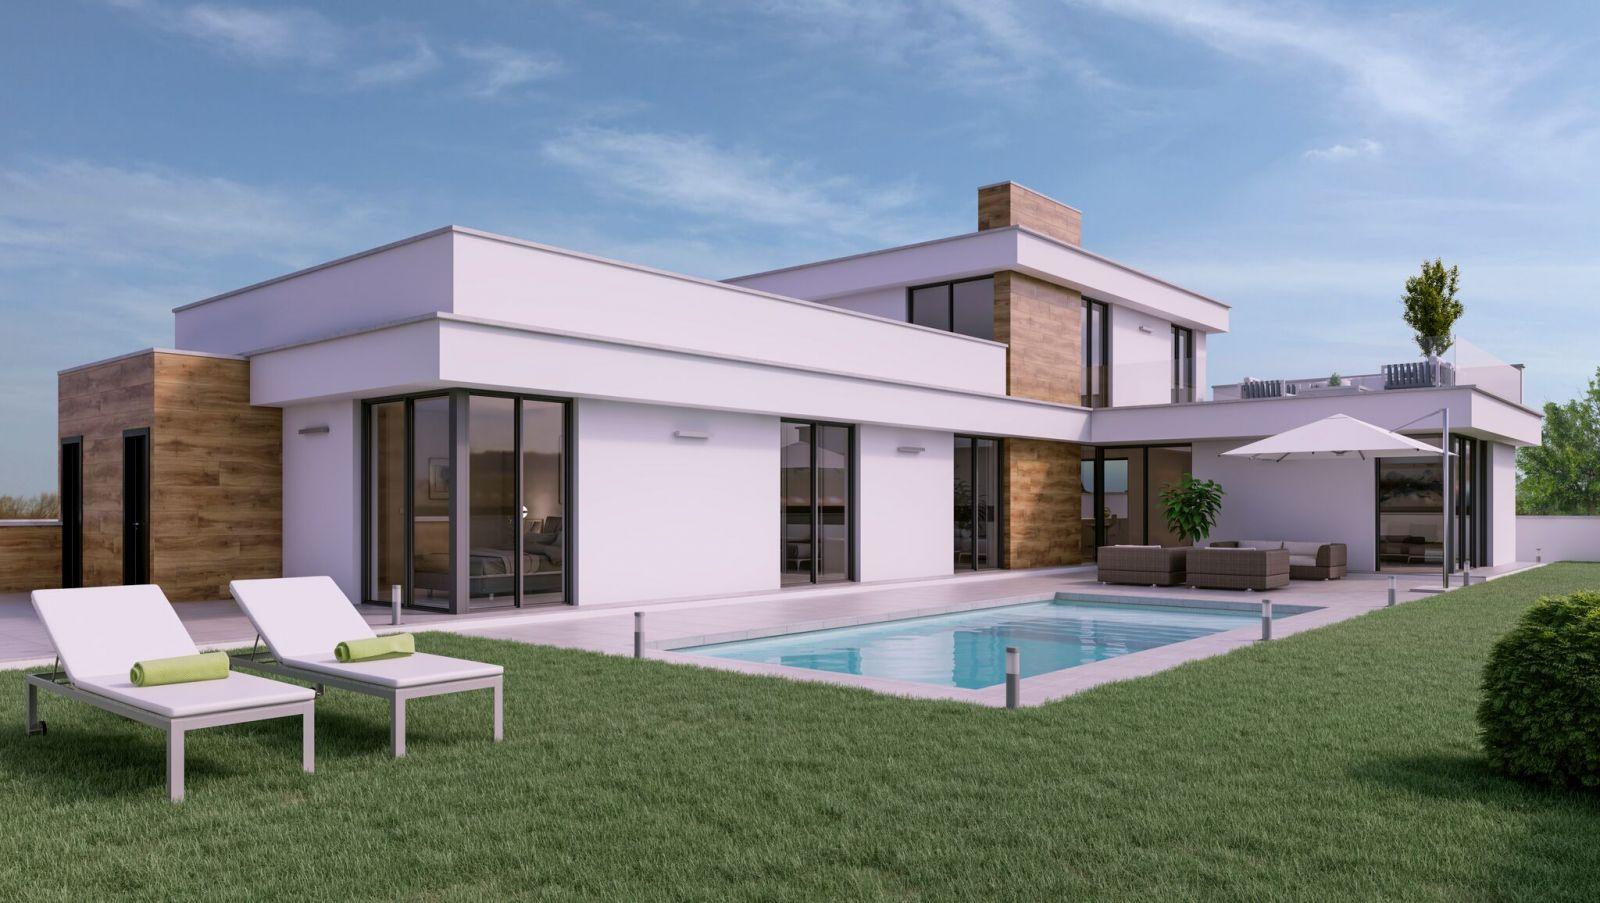 Roda Golf Villas For Sale - Your Move Spain